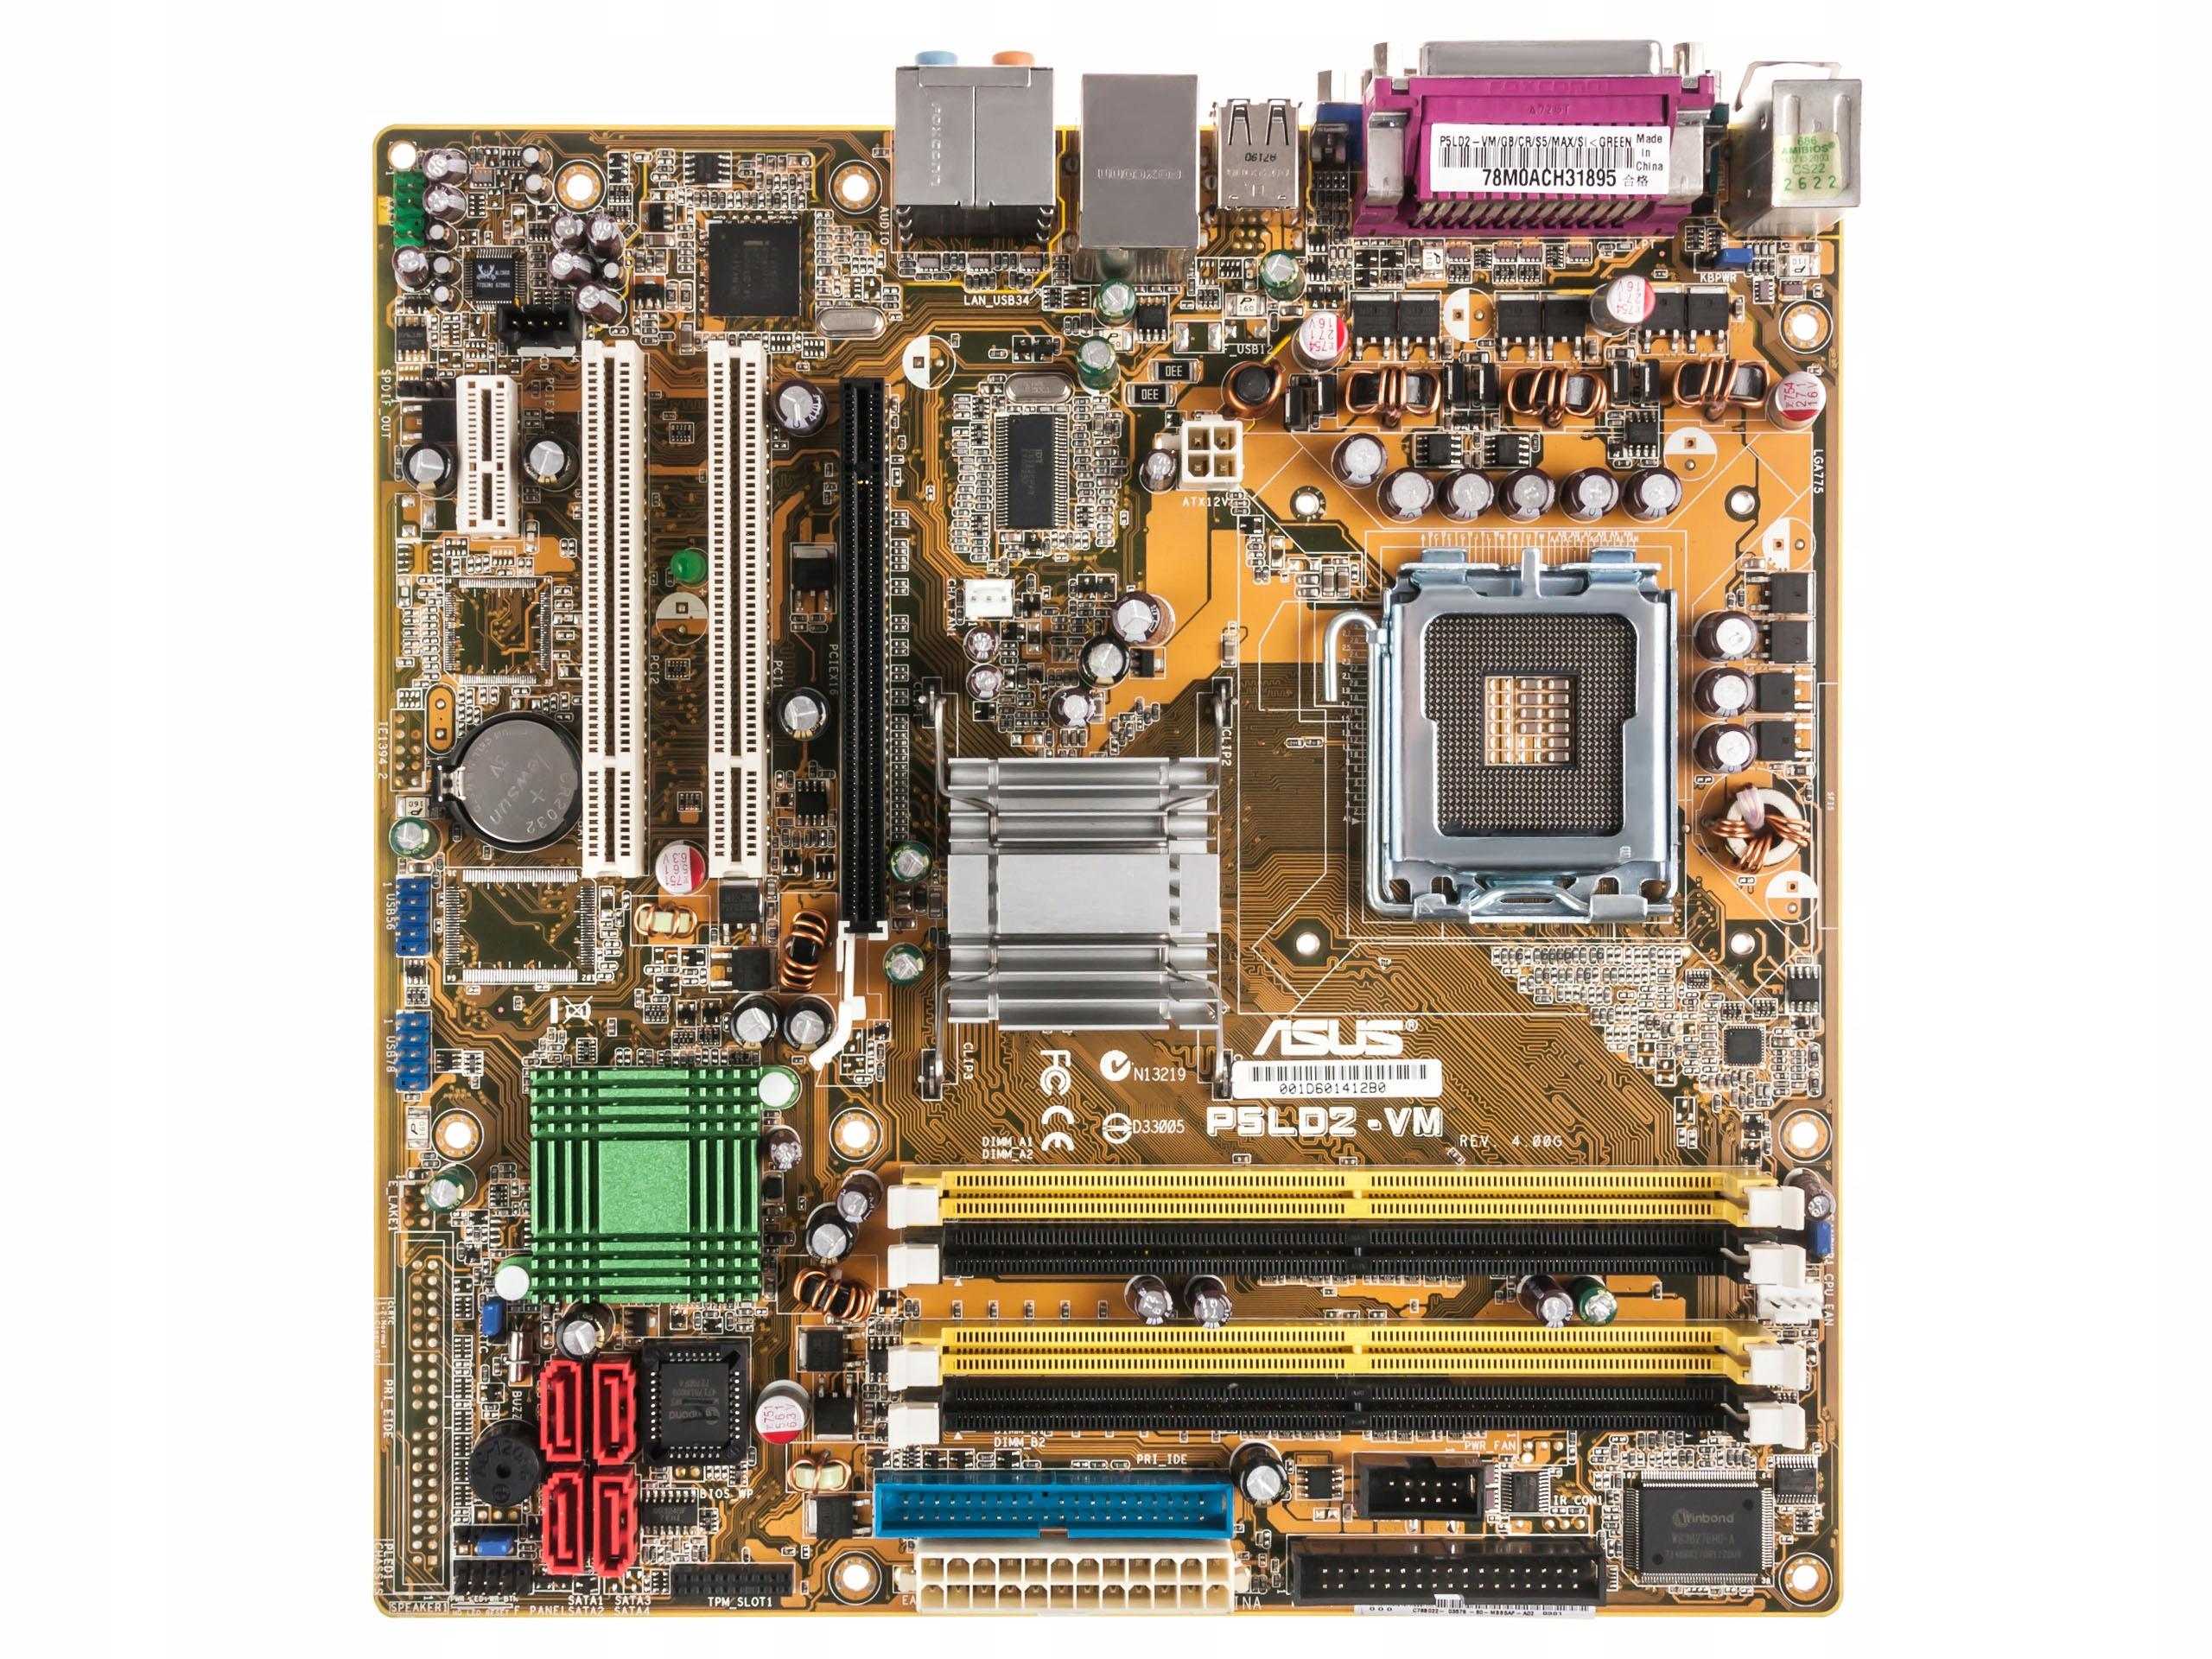 ASUS P5LD2-VM PC PROBE II DRIVER FREE